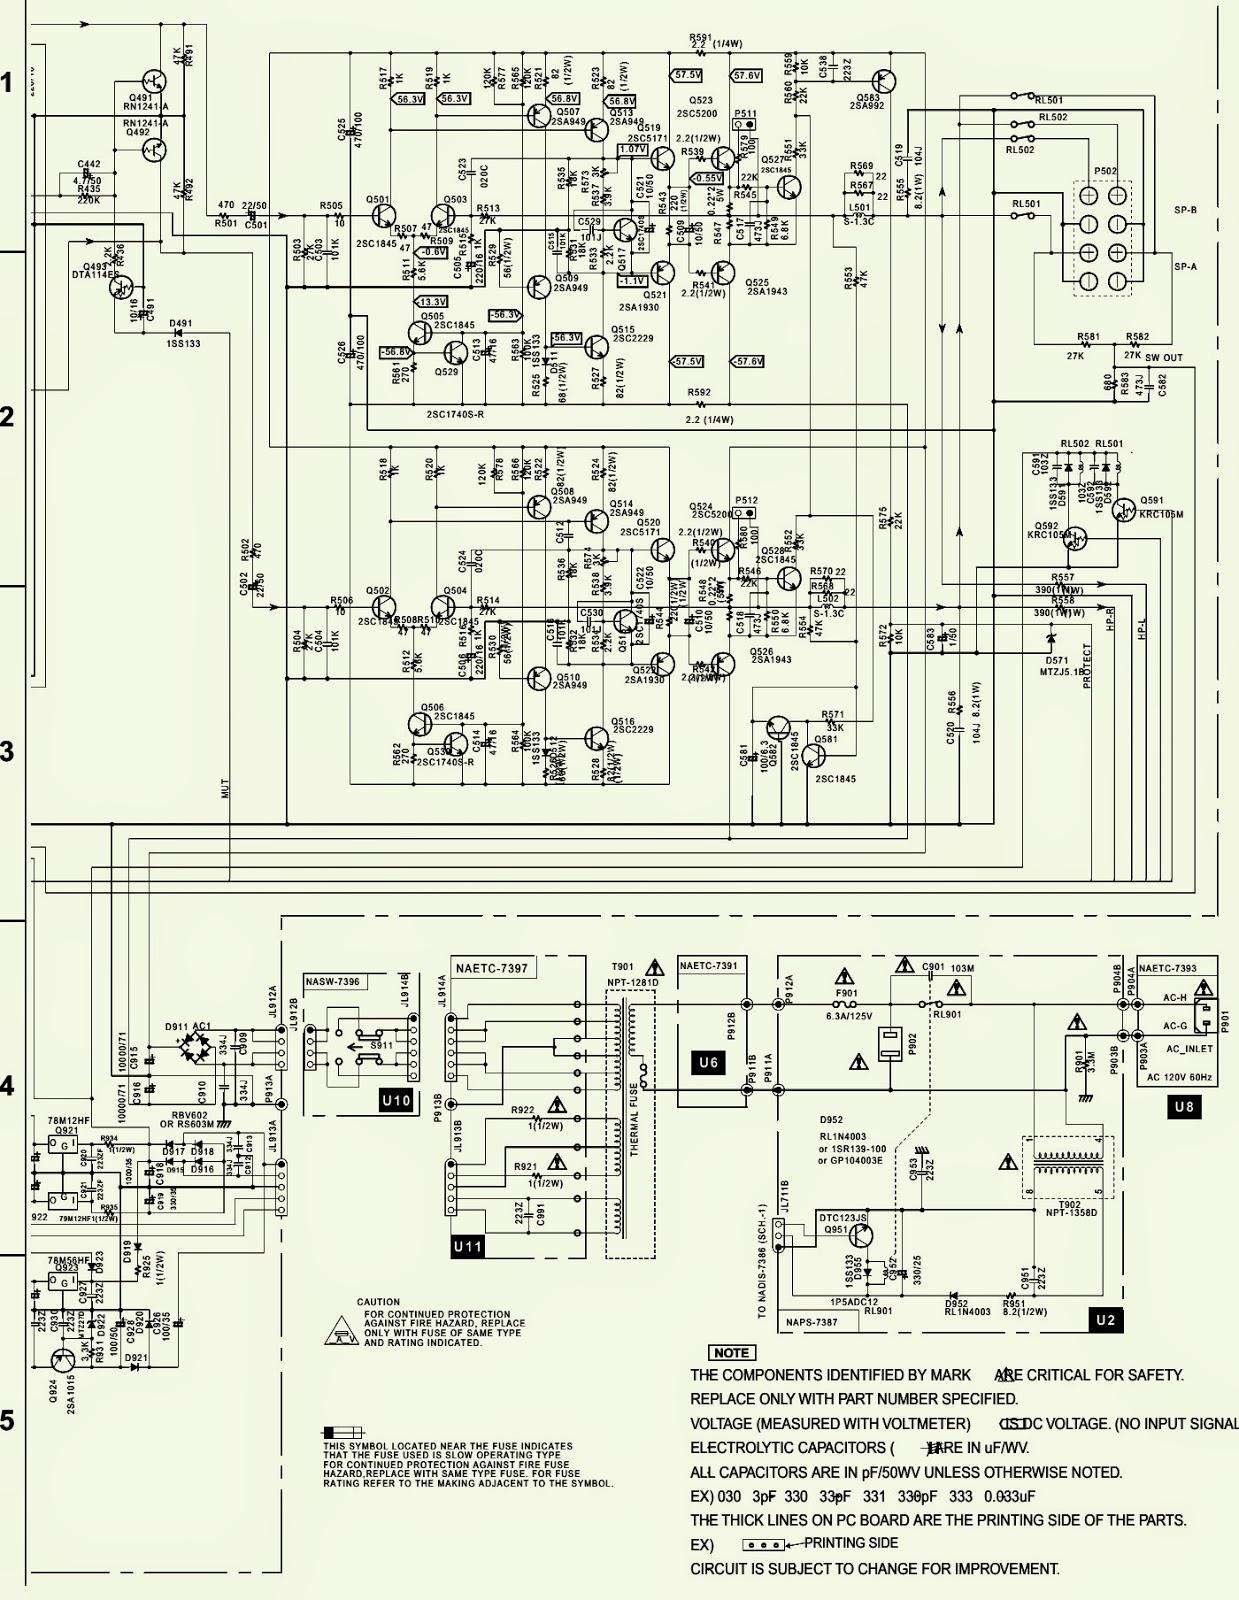 medium resolution of integra dtm5 3 schematic circuit diagram 2sc5200 npn 2sa1943 pnp outout transistors electro help